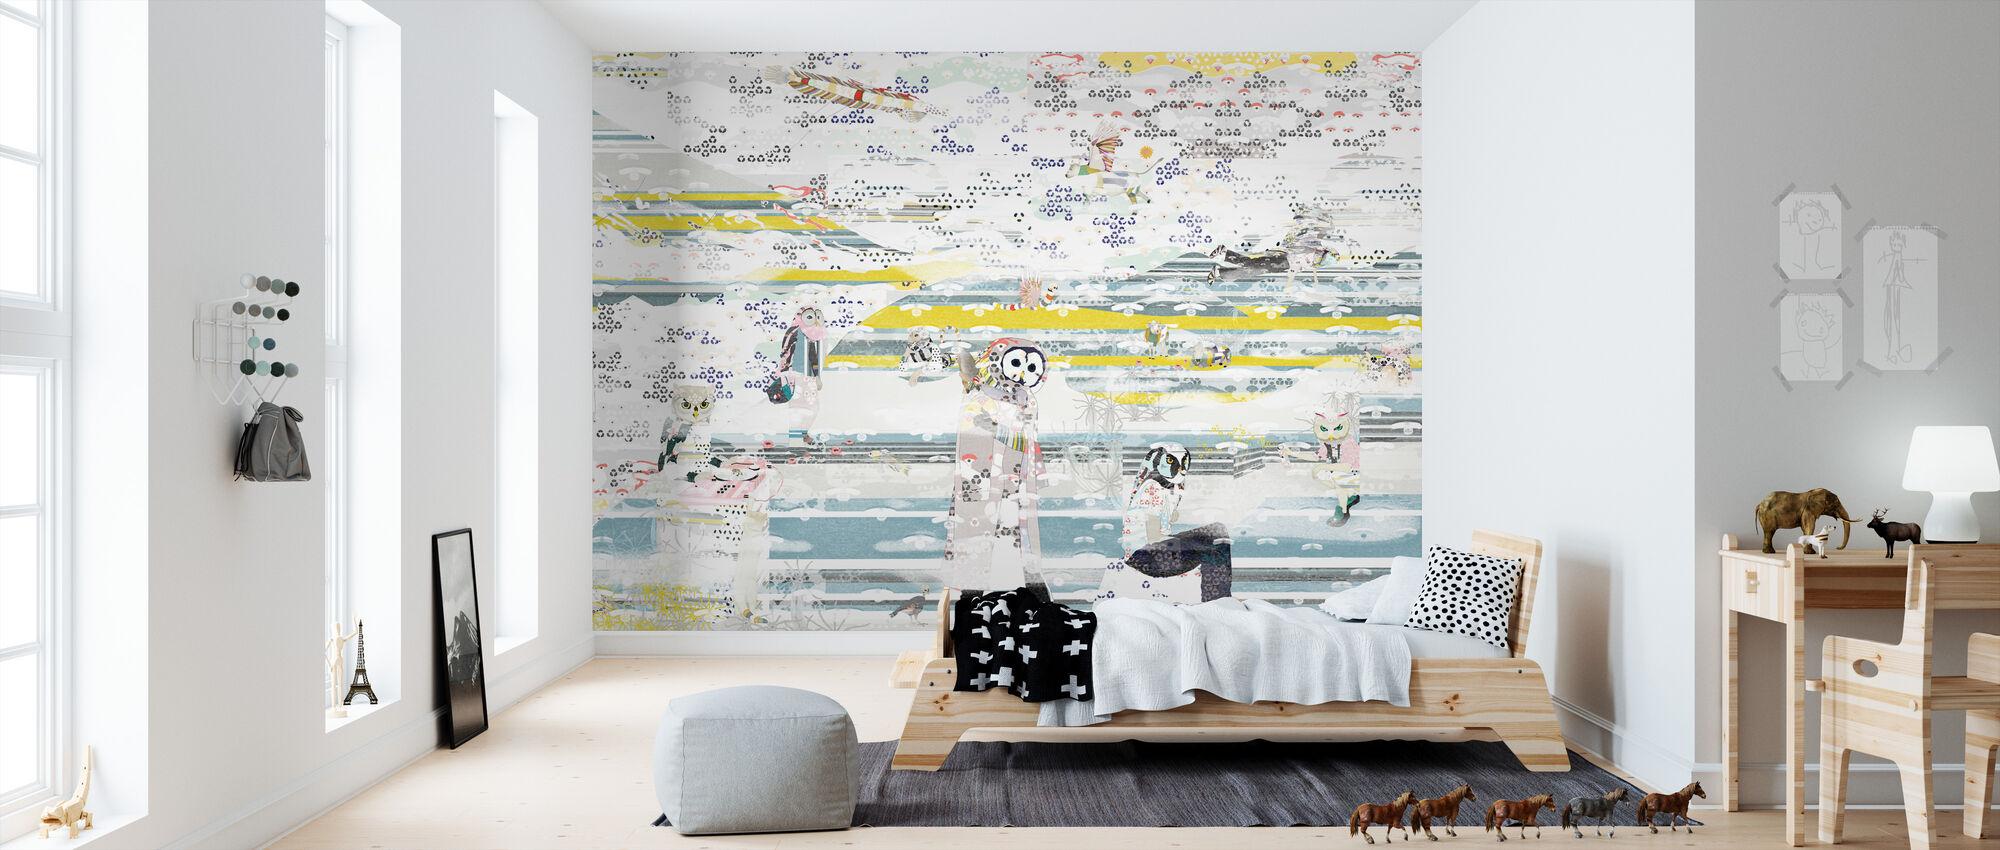 Pier Fires - Fuji One - Wallpaper - Kids Room